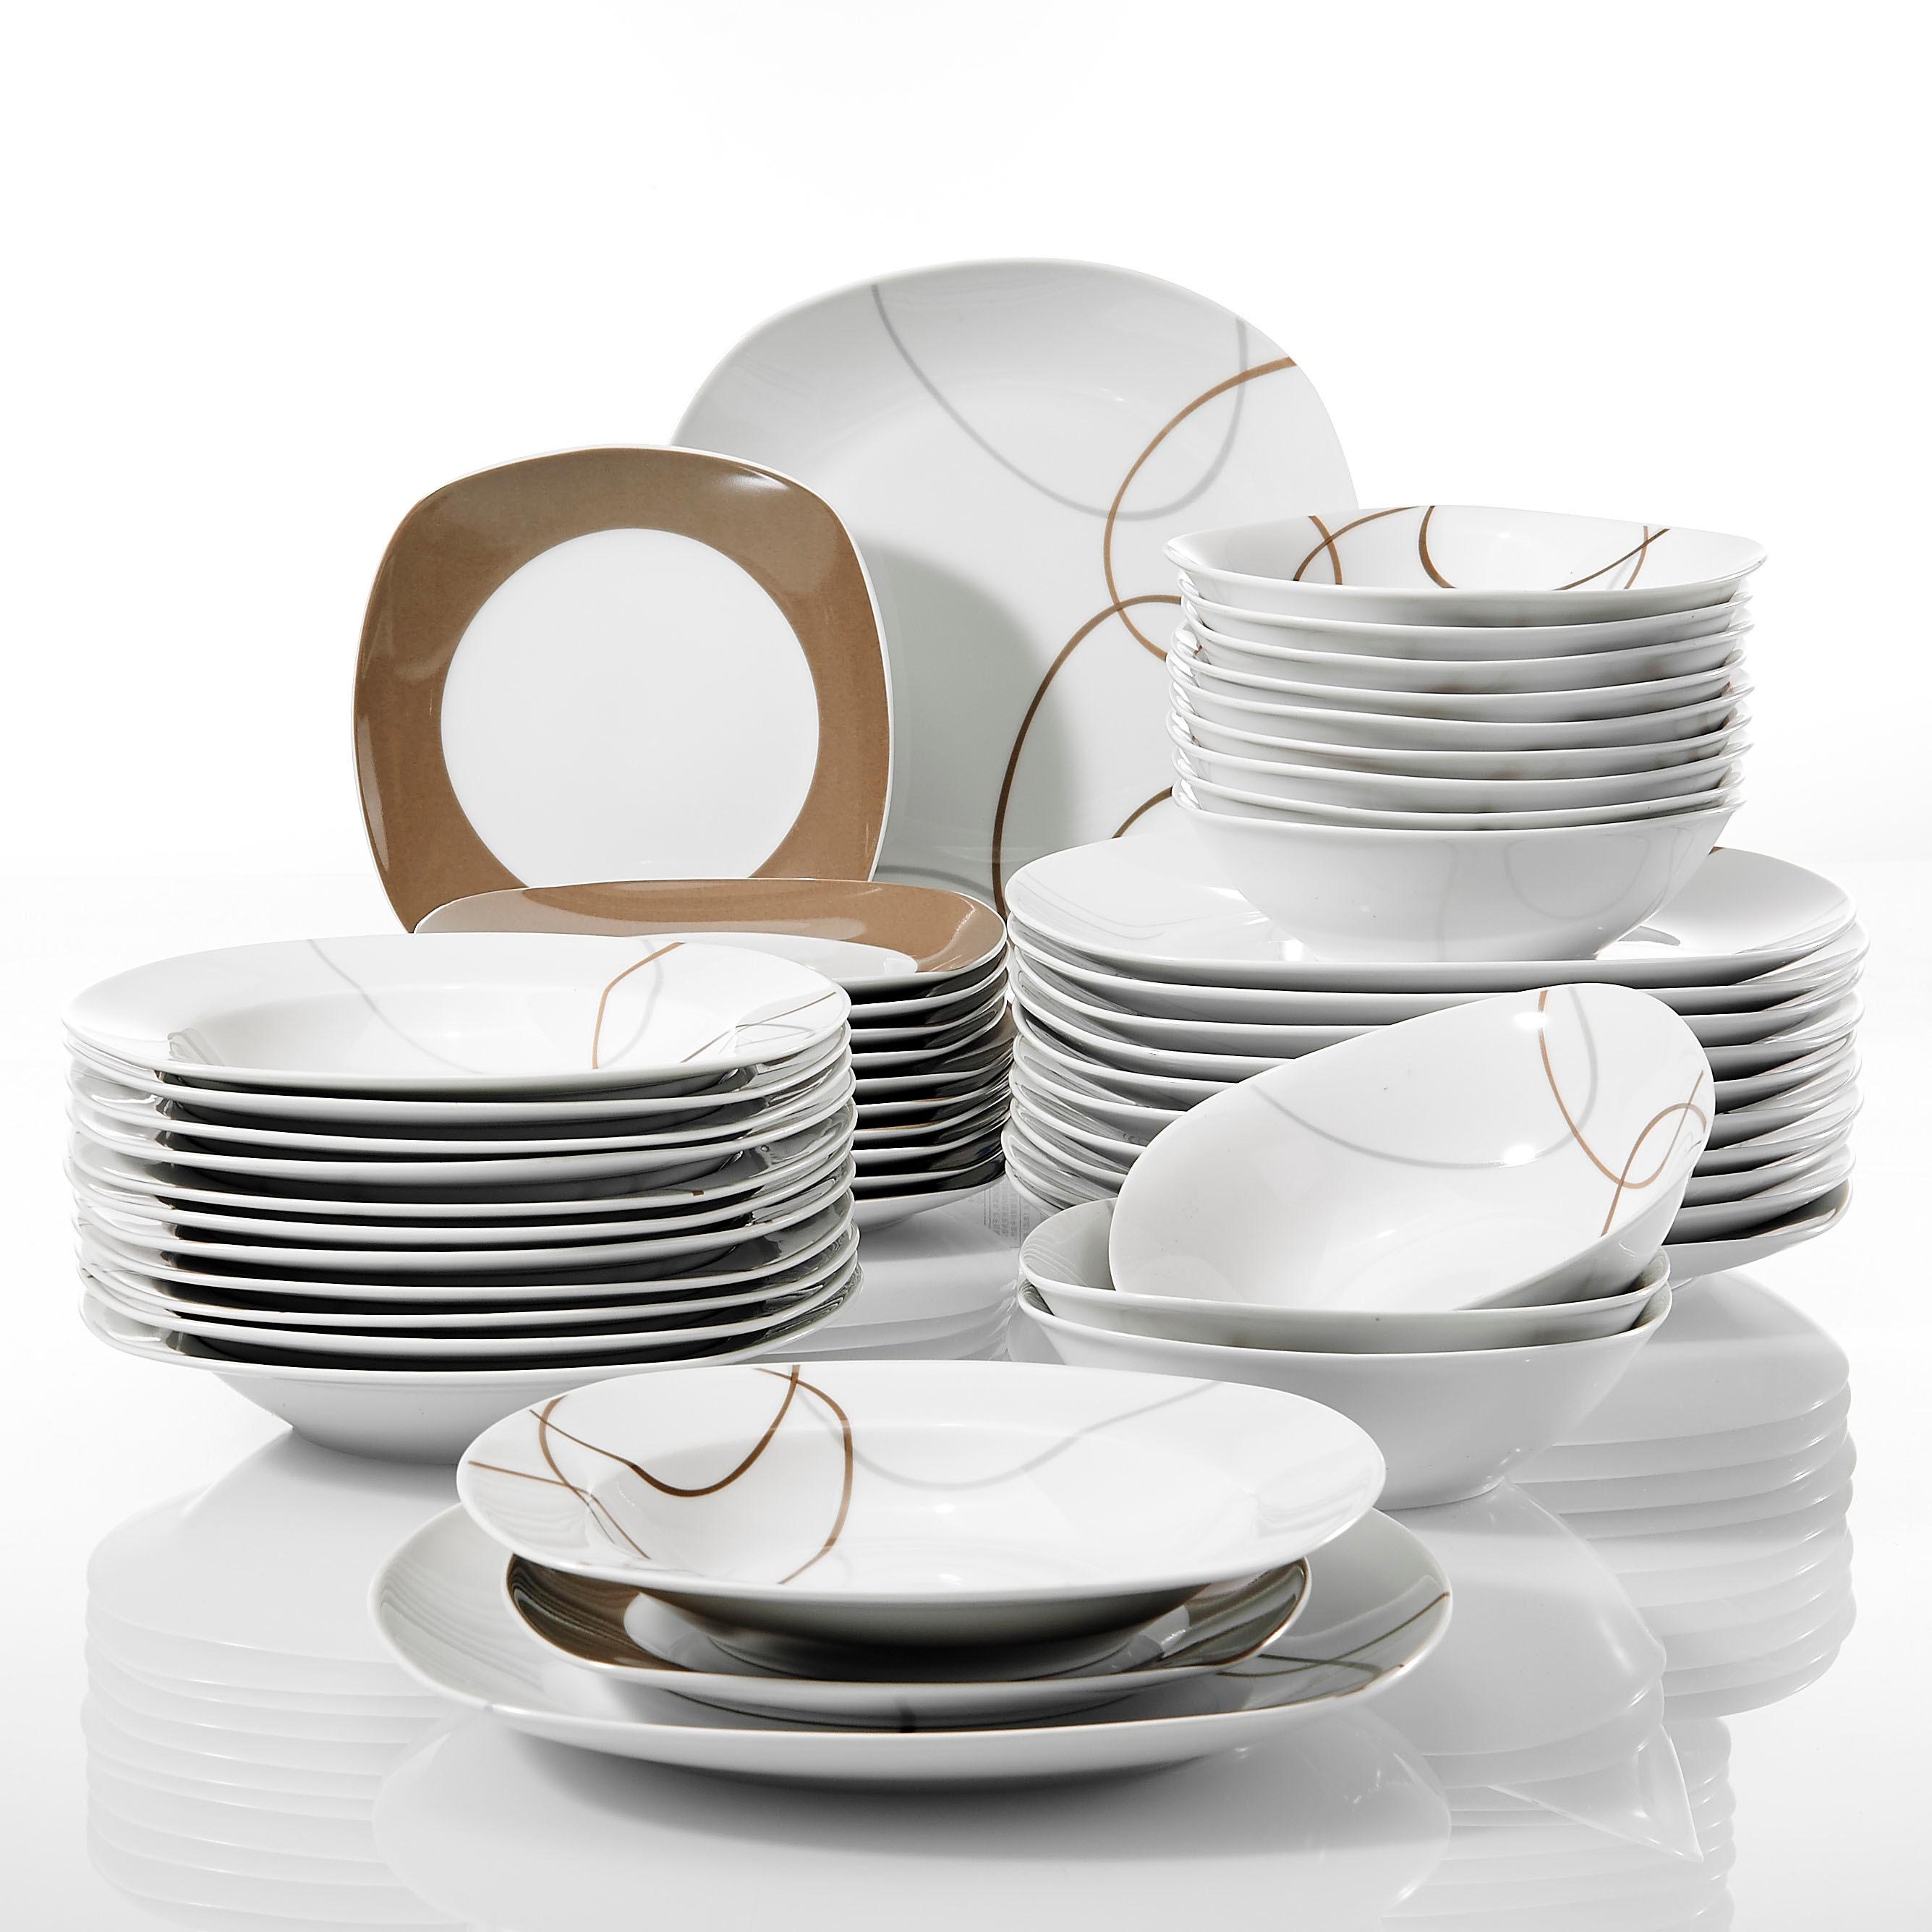 Veweet Nikita 48 Piece Kitchen Dinner Combi Set Porcelain Tableware Plate Set With Bowls Dessert Plate Soup Plates Dinner Plate Dinnerware Sets Aliexpress